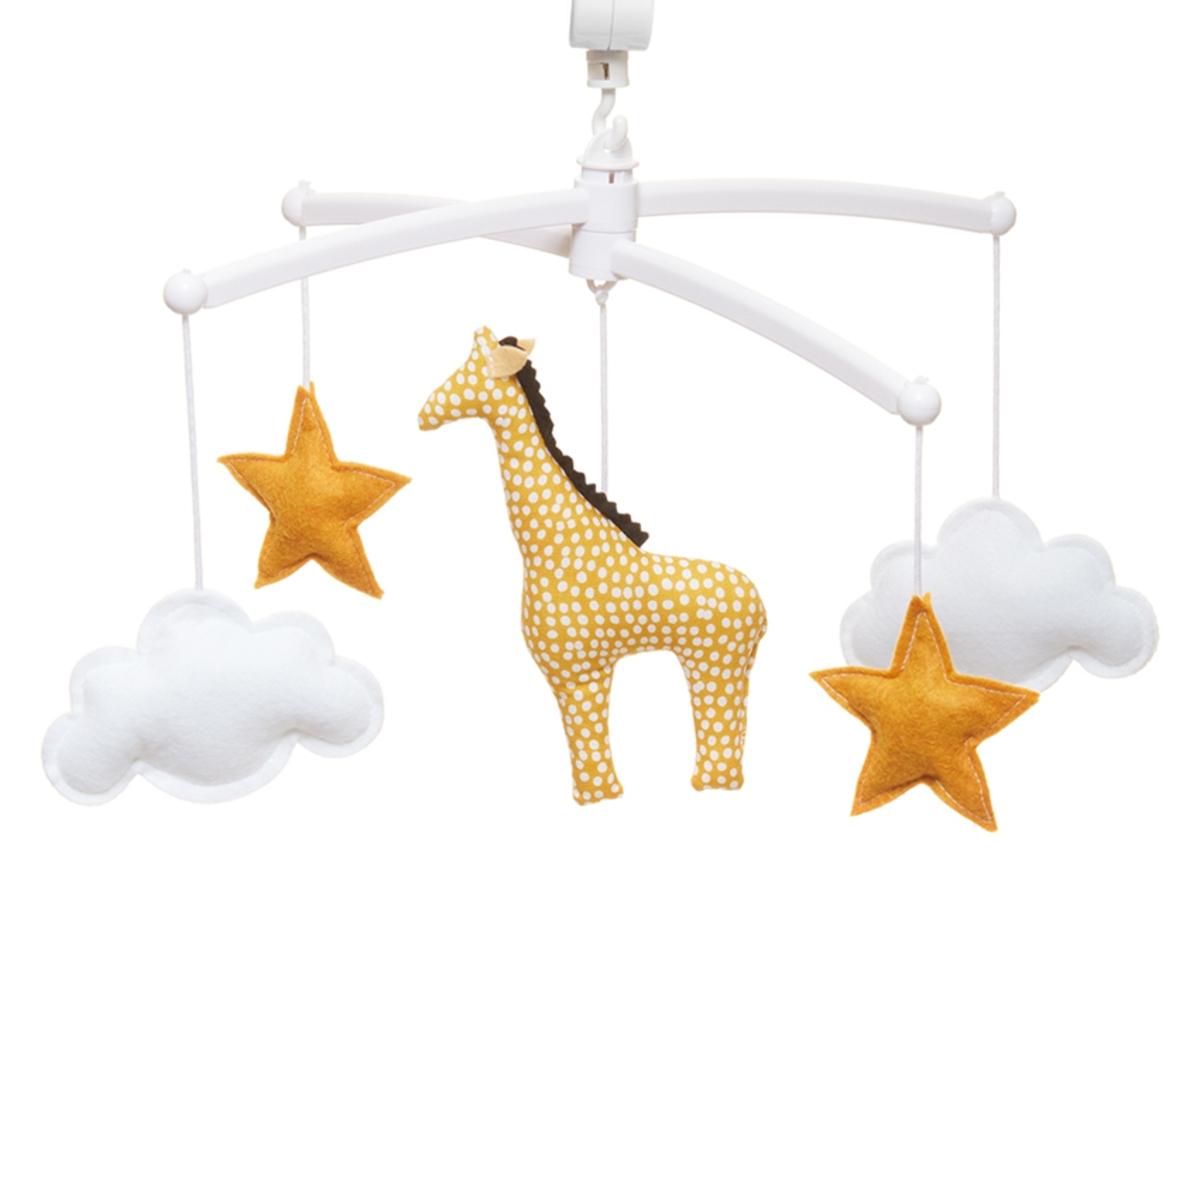 Mobile Mobile Musical Girafe - Jaune Mobile Musical Girafe - Jaune